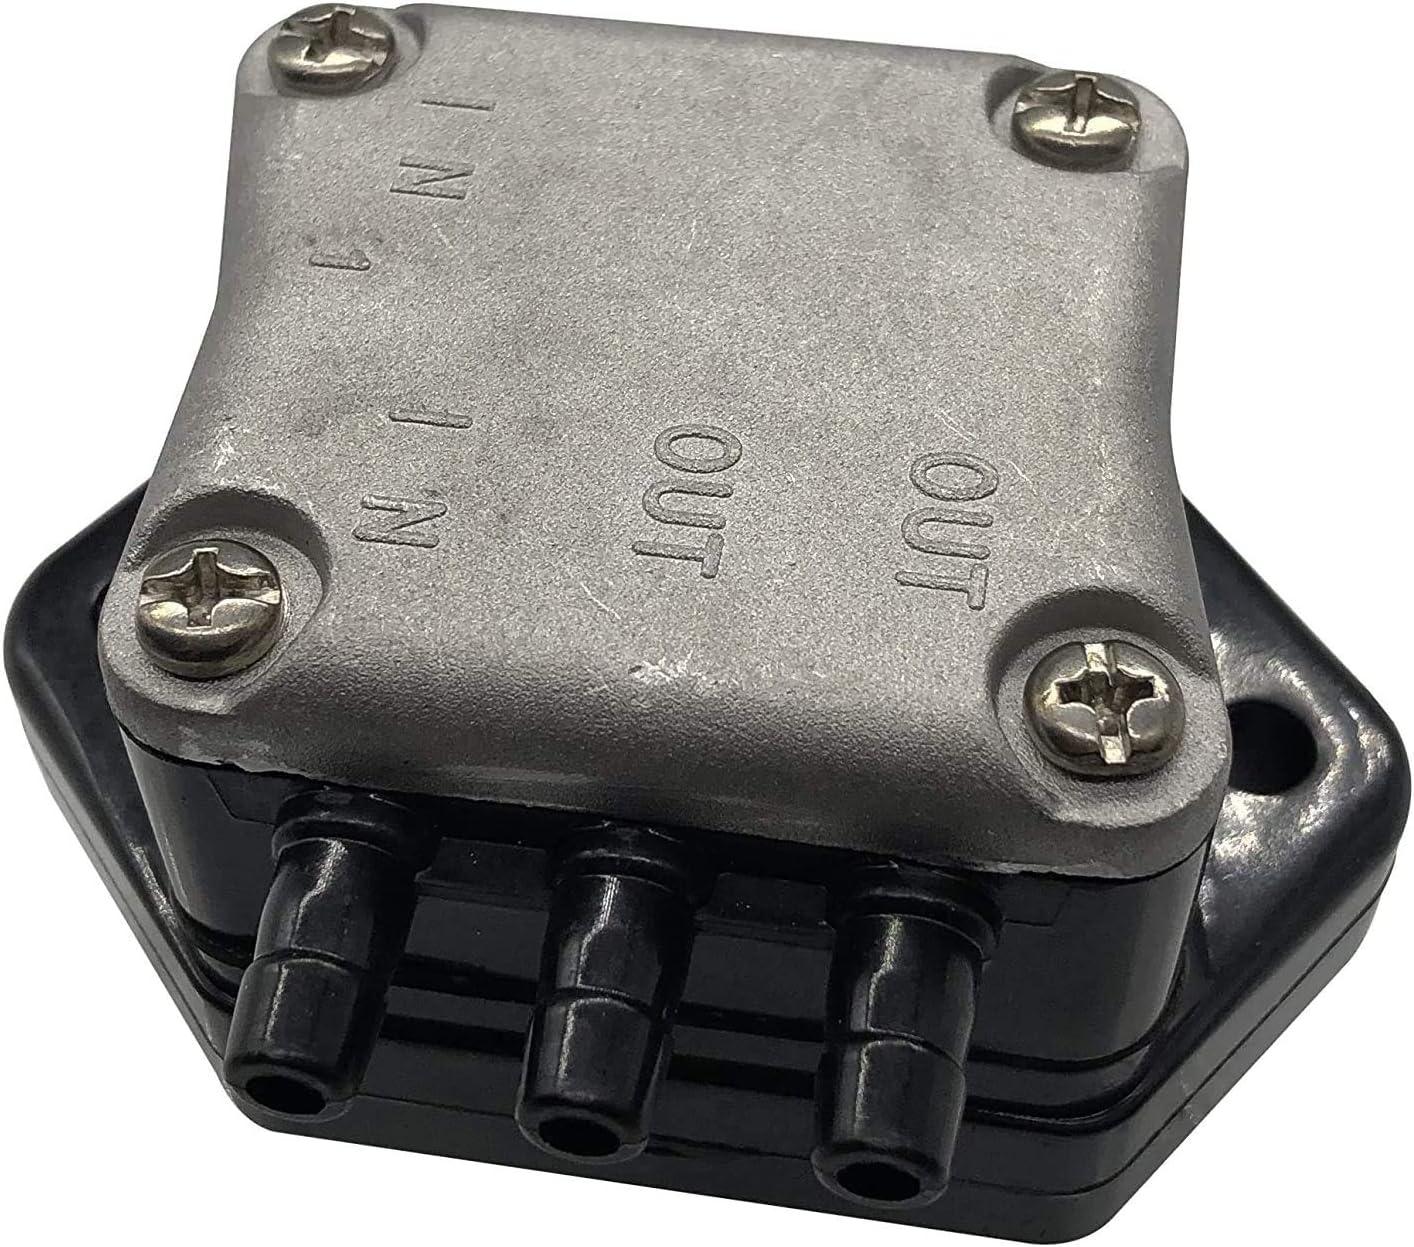 COP Boat Motor Fuel Pump Assy for Mercury Mariner 826398T 3 Yamaha Outboard 62Y-24410-04-00 4-Stroke 25HP 30HP 35HP 40HP 45HP 50HP 55HP 60HP Motor Engine